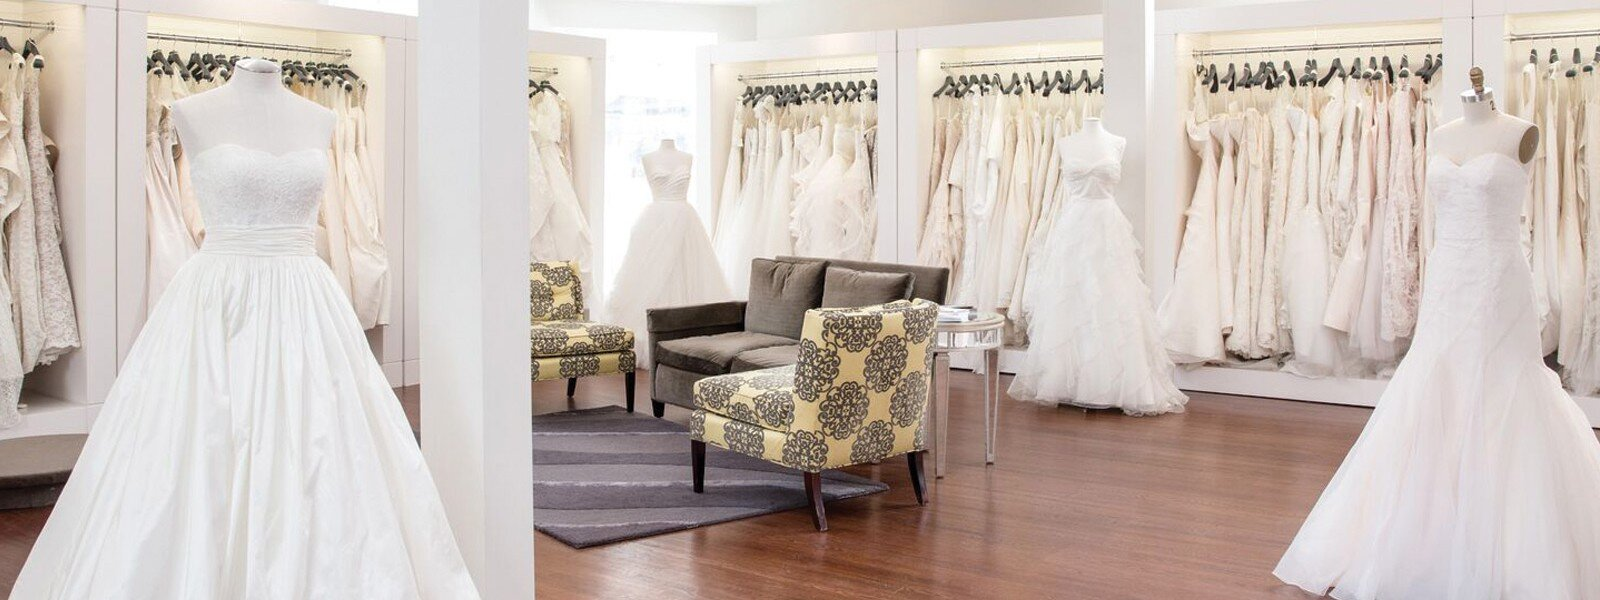 Elizabeth-Johns-Bridal-Shop.jpg